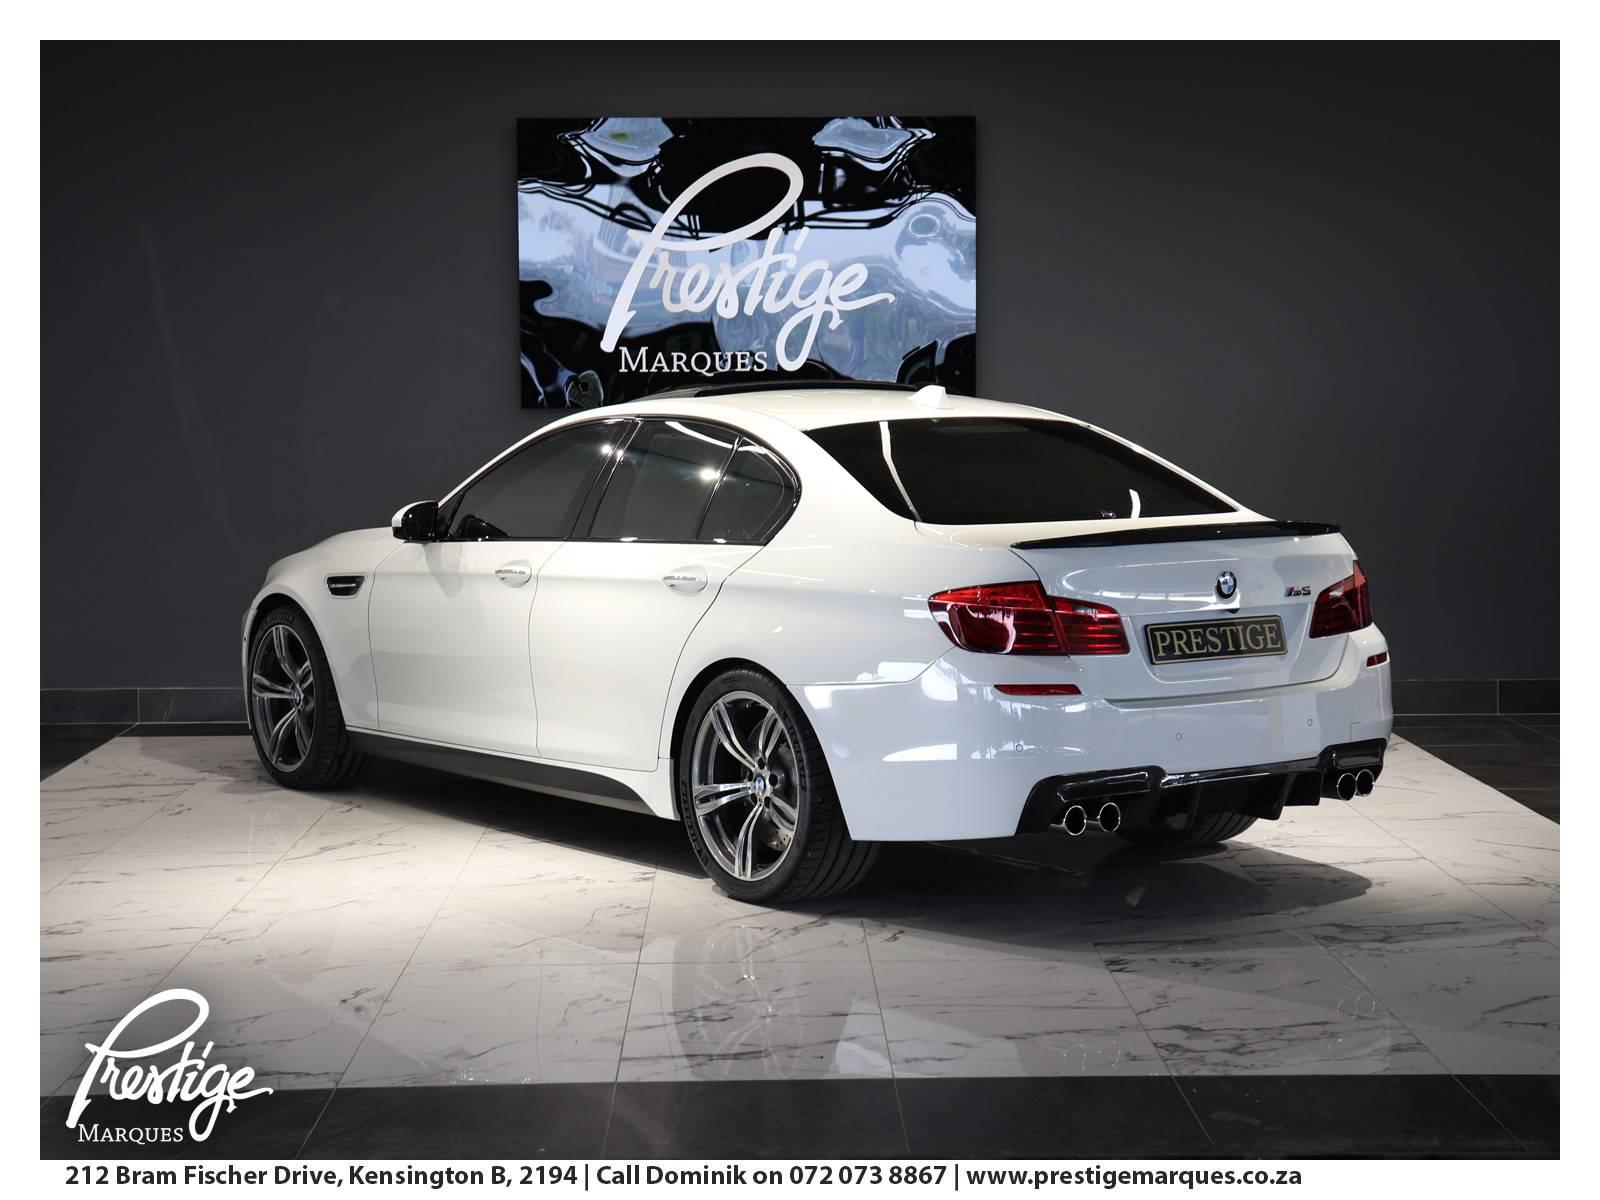 2015-BMW-F10-M5-MDCT-Prestige-Marques-Randburg-Sandton-4